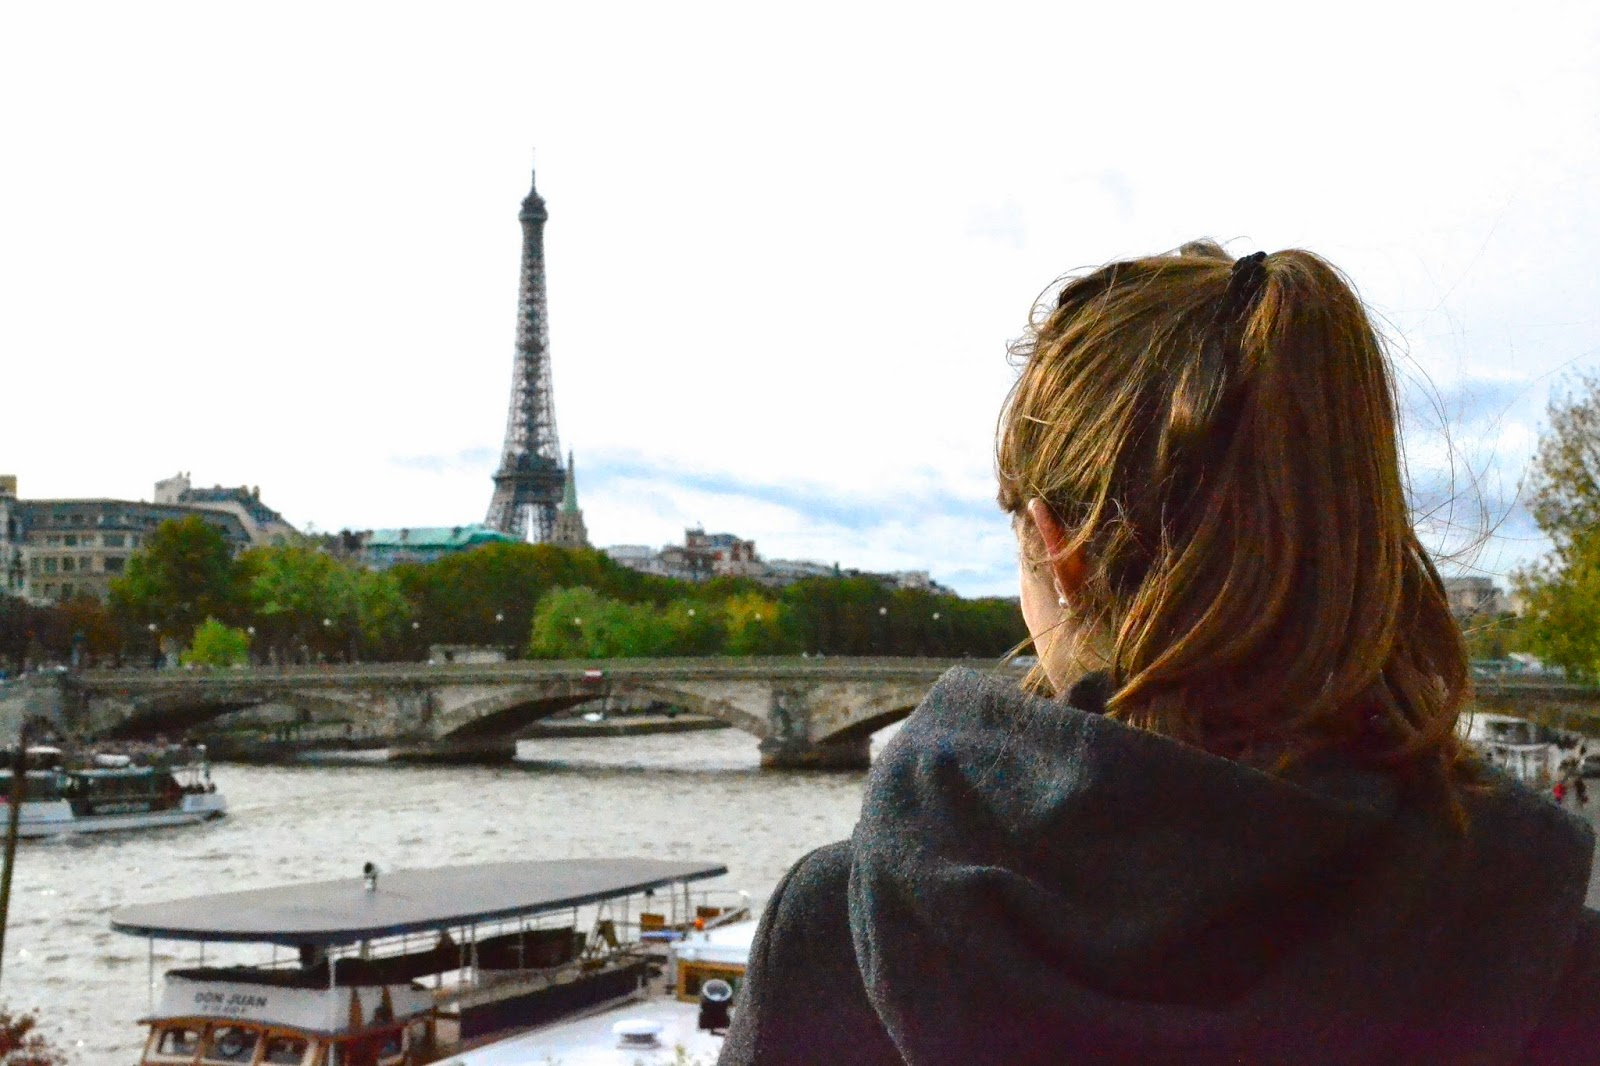 Puente the Alexander III, rio sena, paris, guia de viaje